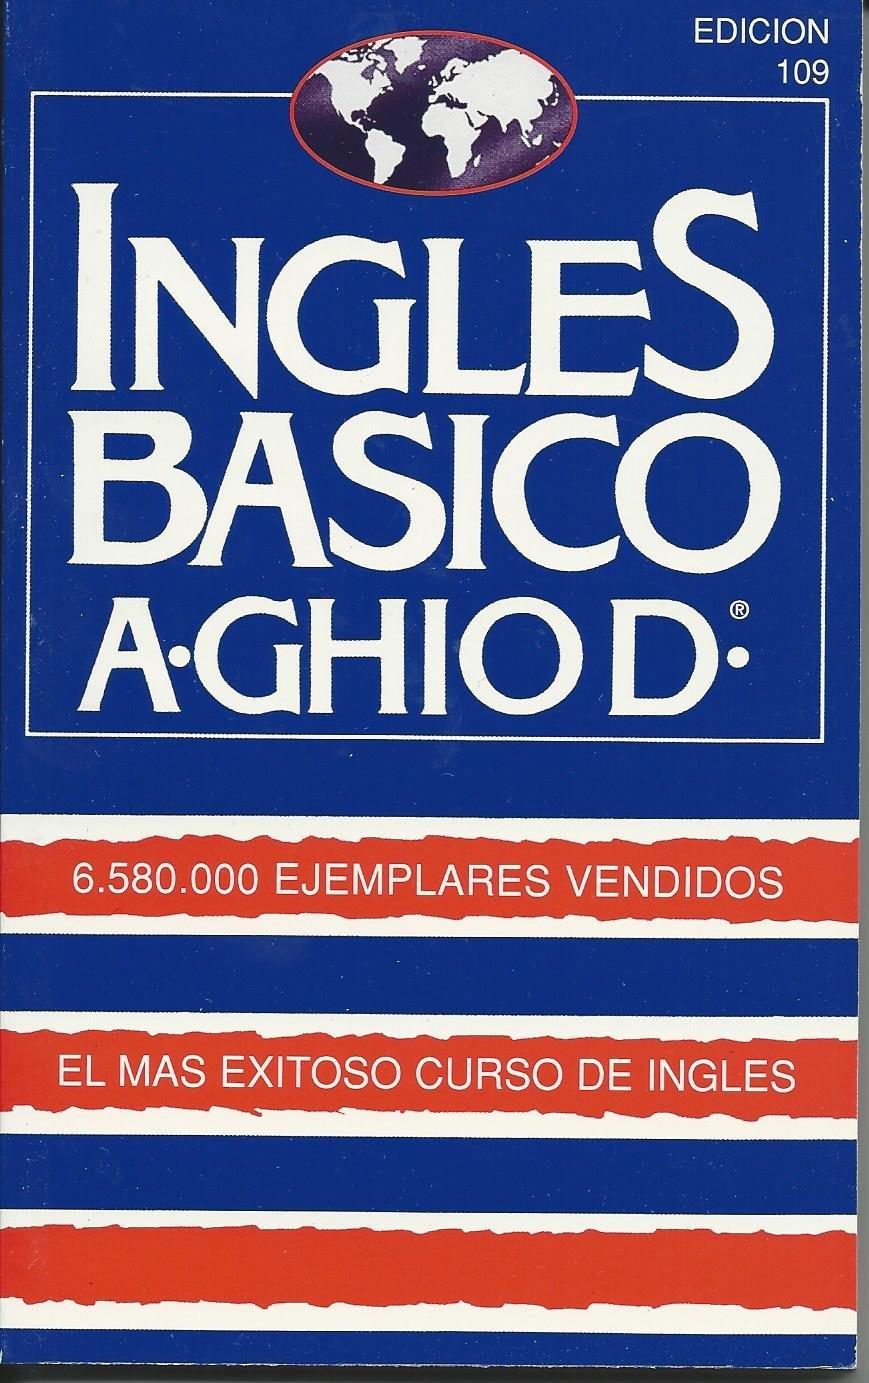 Ingles Basico A Ghio D (Spanish) Paperback – Mini Calendar, January 2, 2015